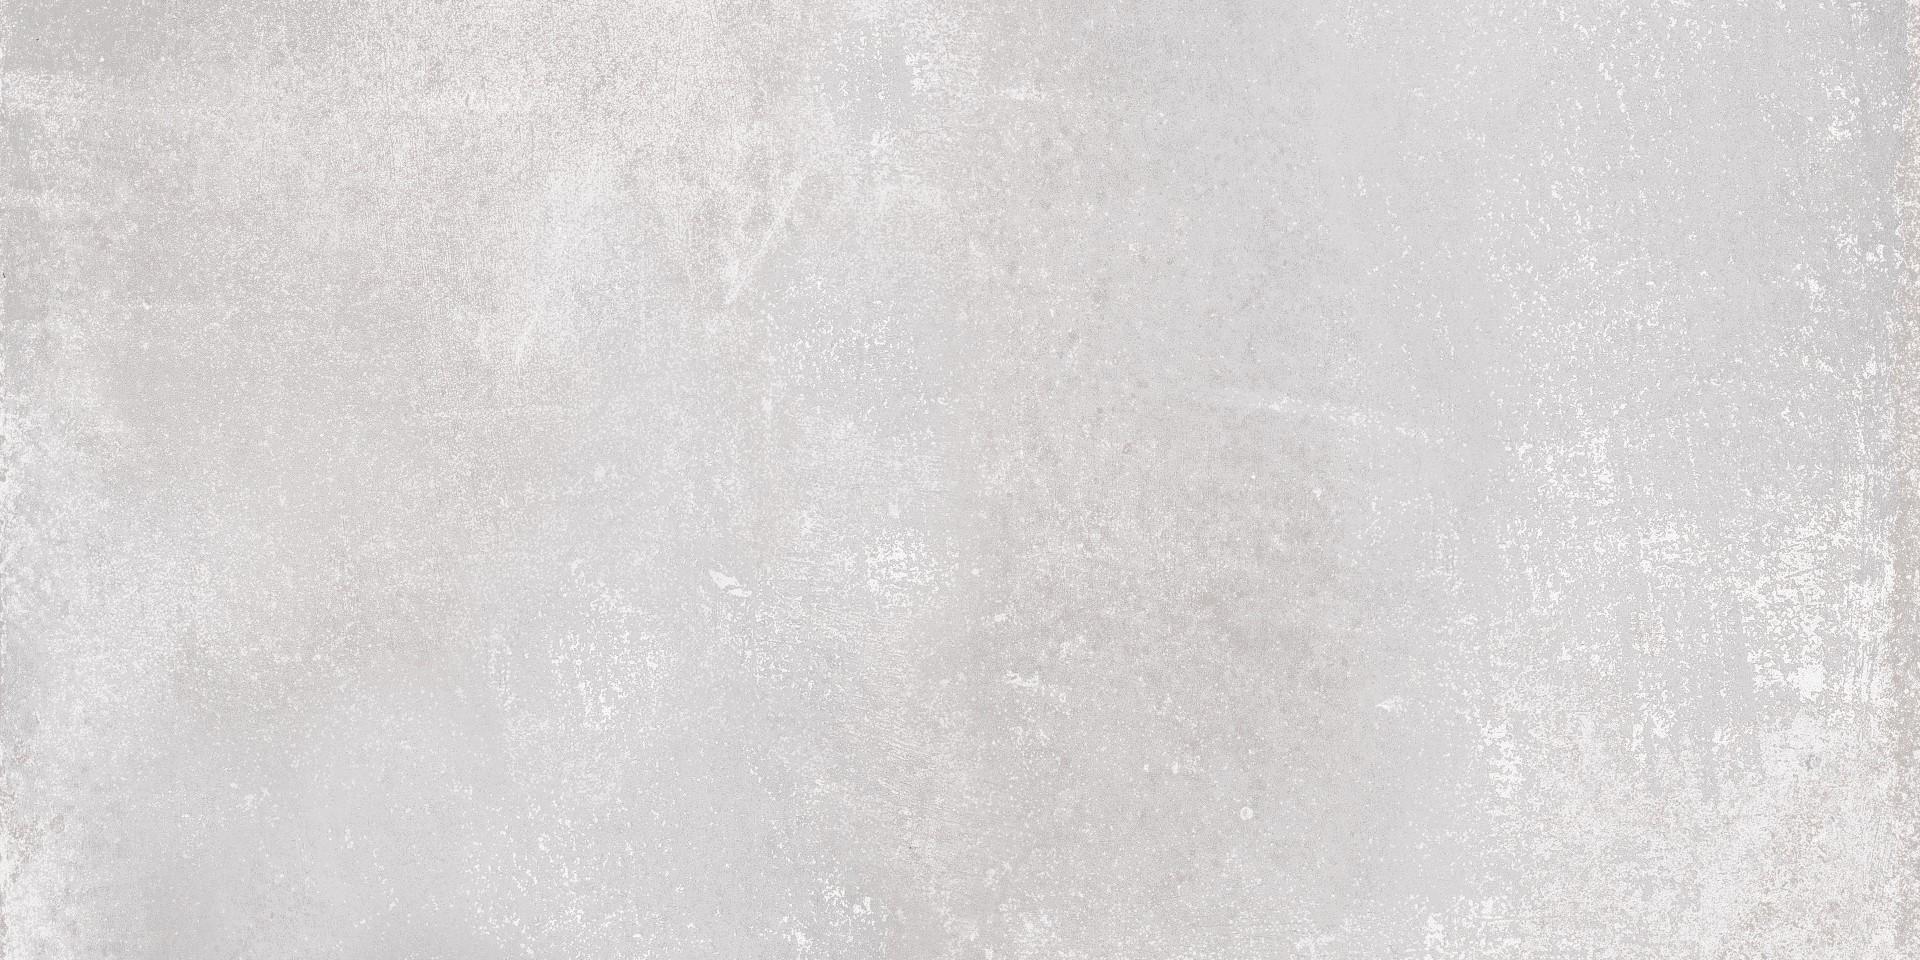 Obklad/dlařba Cozumel 60x120 cm, mat